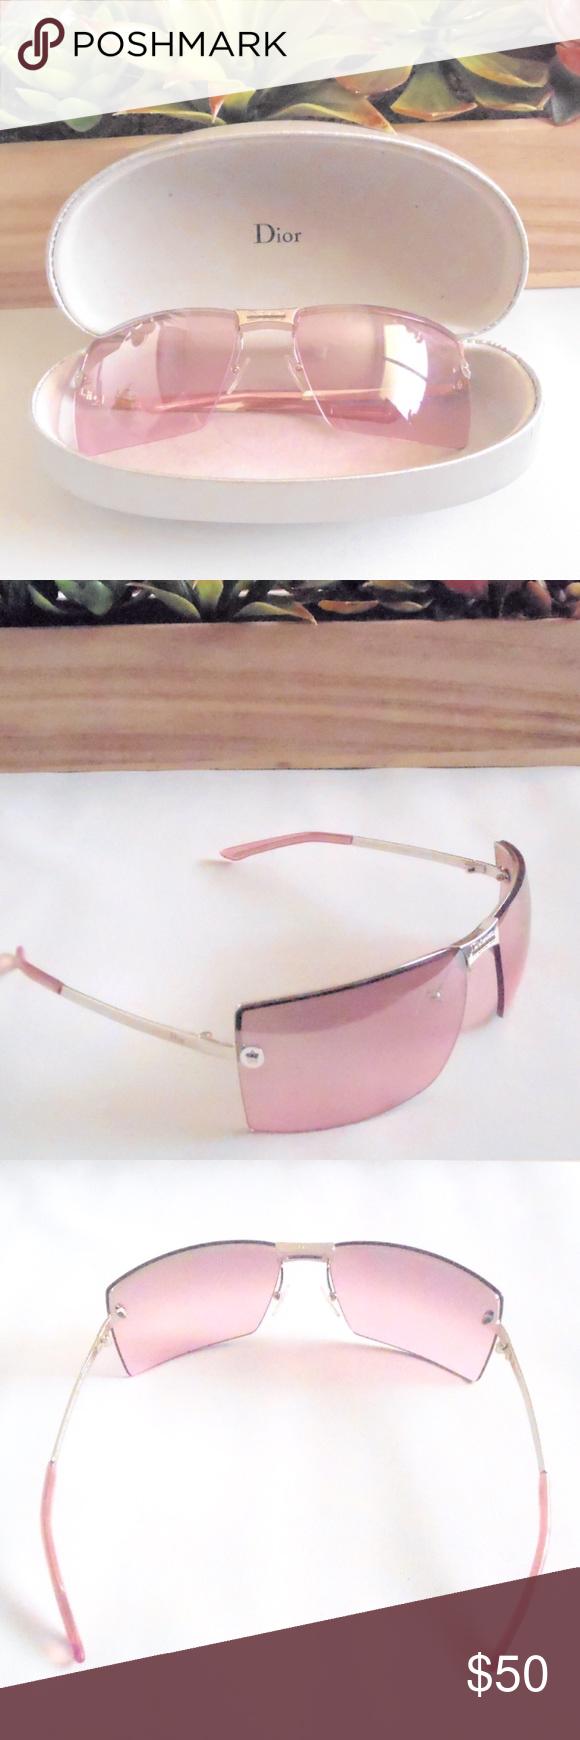 995972bd0a5d Christian Dioe Adiorable 2 L Sunglasses Authentic Christian Dior sunglasses  Adiorable 2 L YB7DU